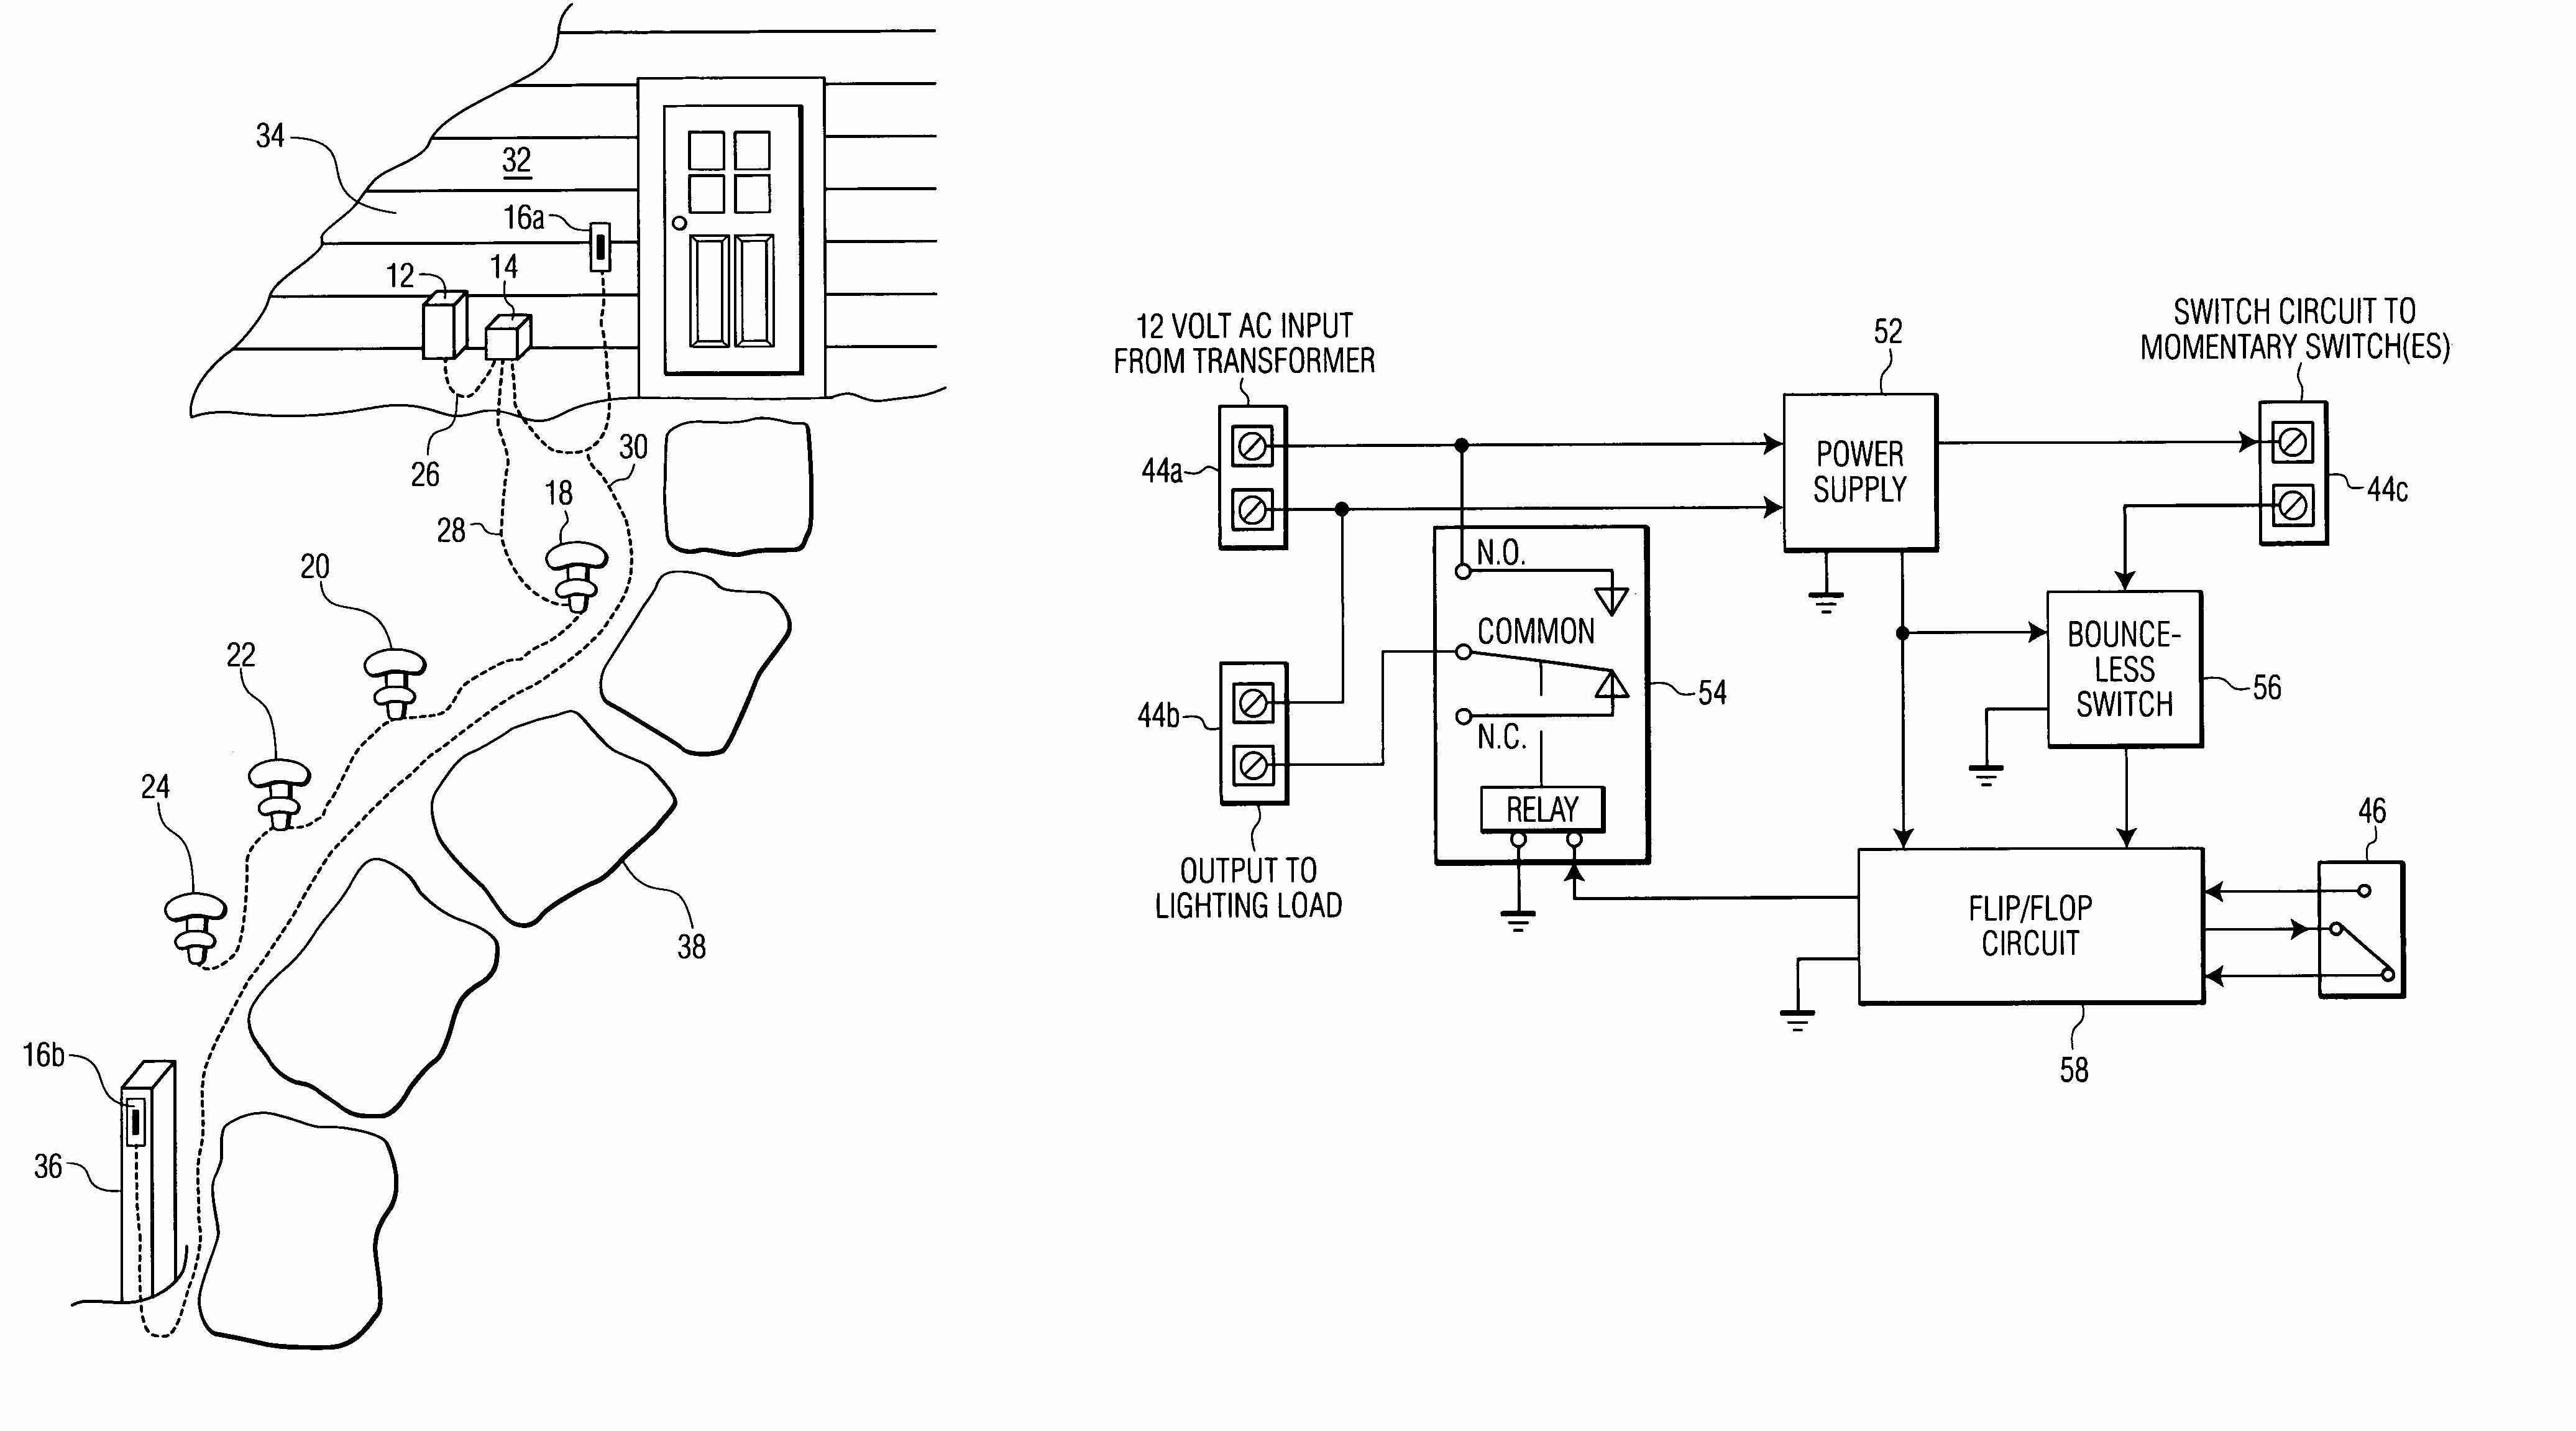 Low Voltage Outdoor Lighting How To | Low Voltage Outdoor ... on